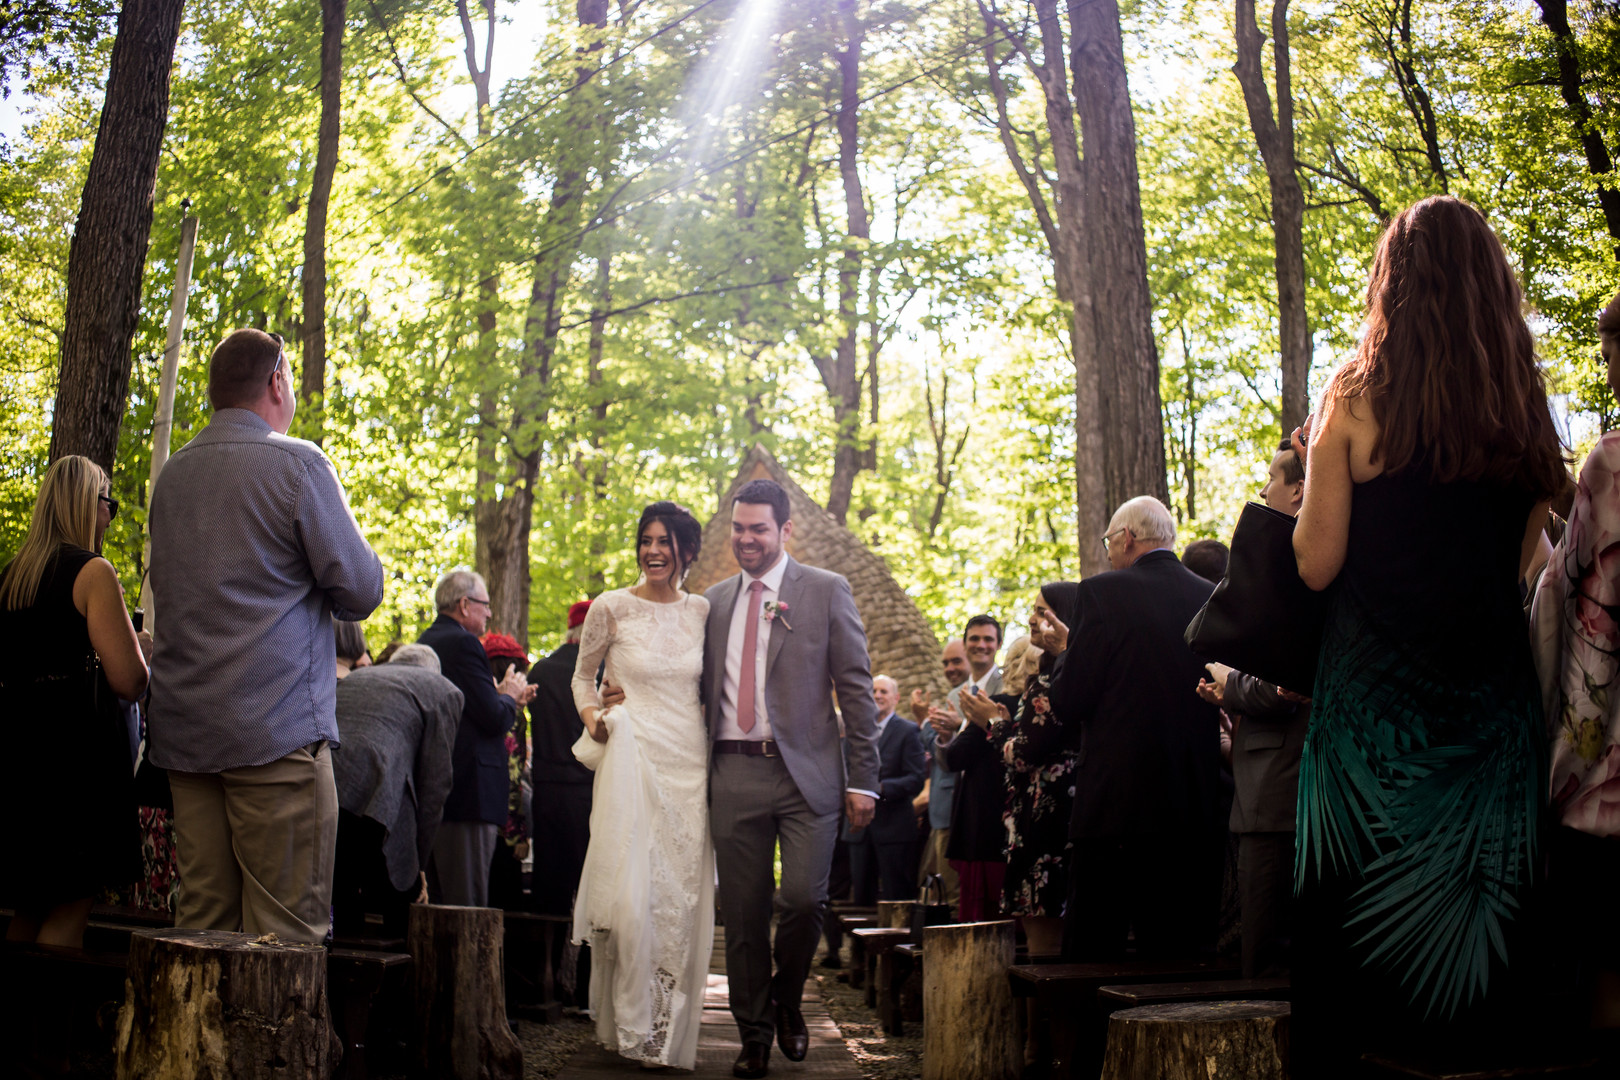 20190526 WEDDING PHOTOGRAPHY - AMANDA CR